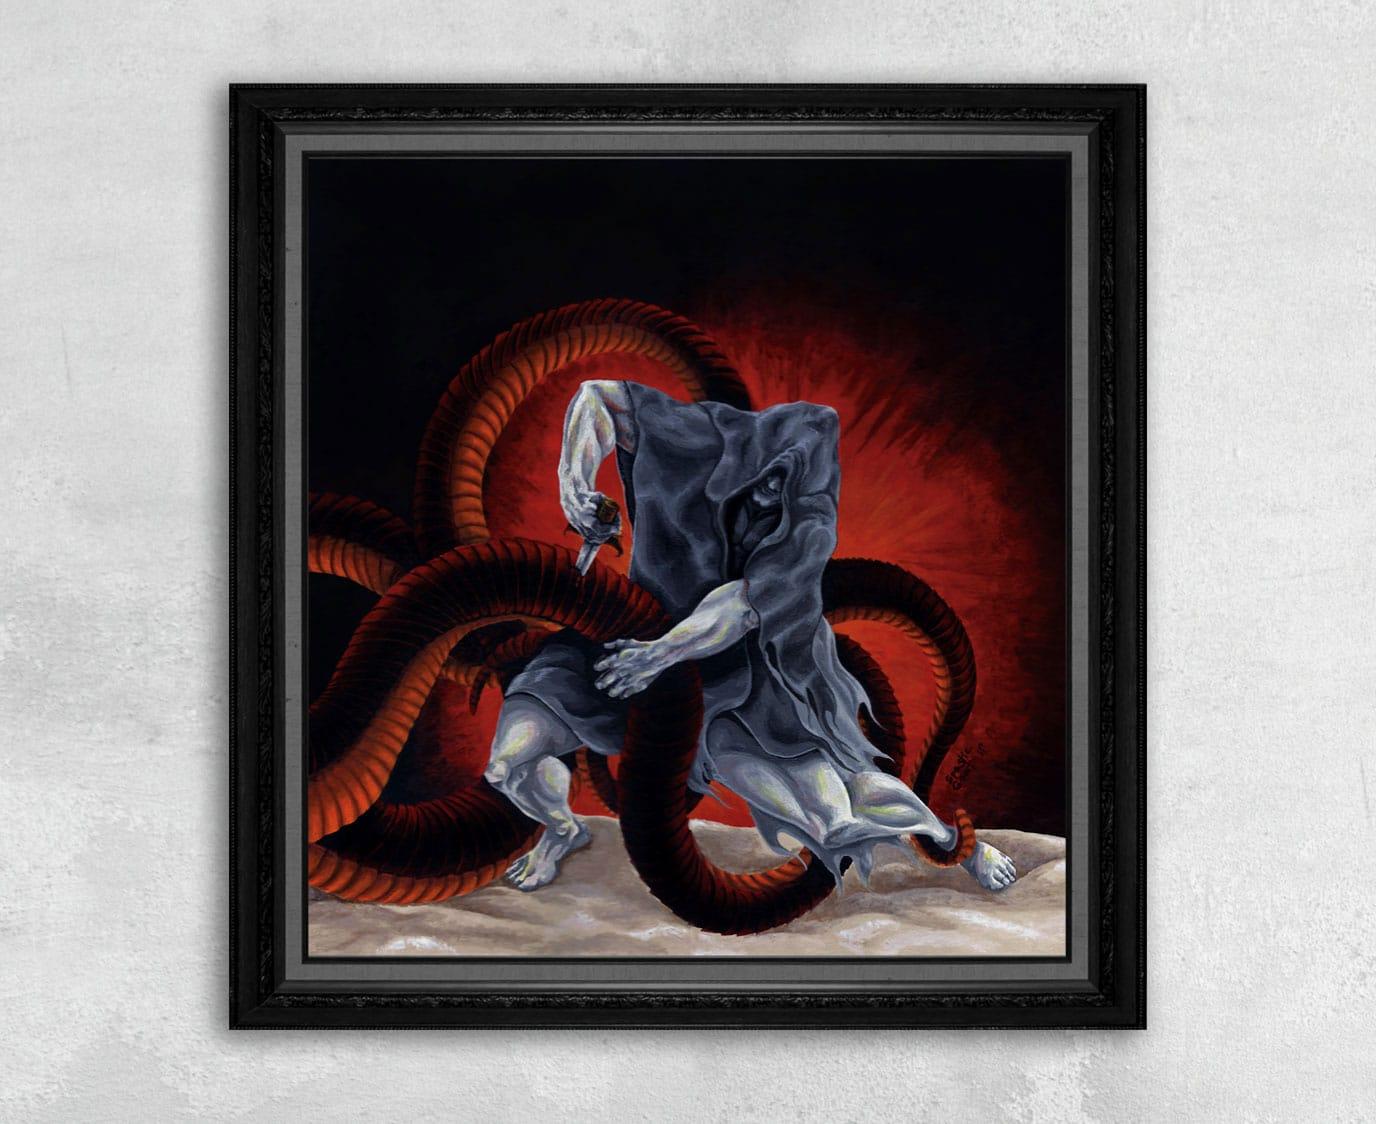 Avenger - Comic Style Print of a Hero Battling a Serpent